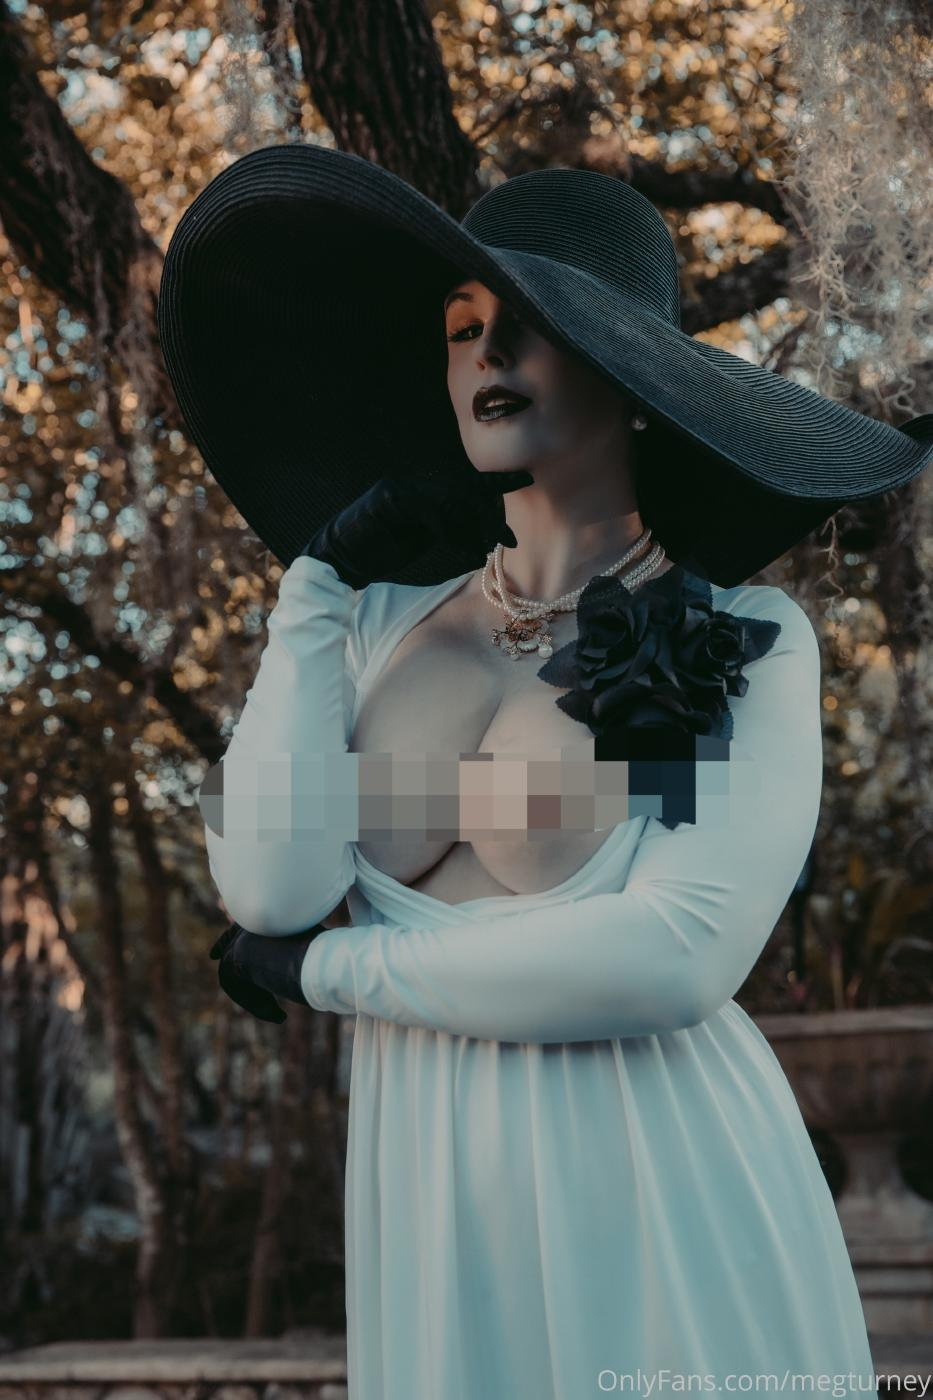 Meg Turney Lady Dimitrescu Cosplay Onlyfans Set Leaked 0027